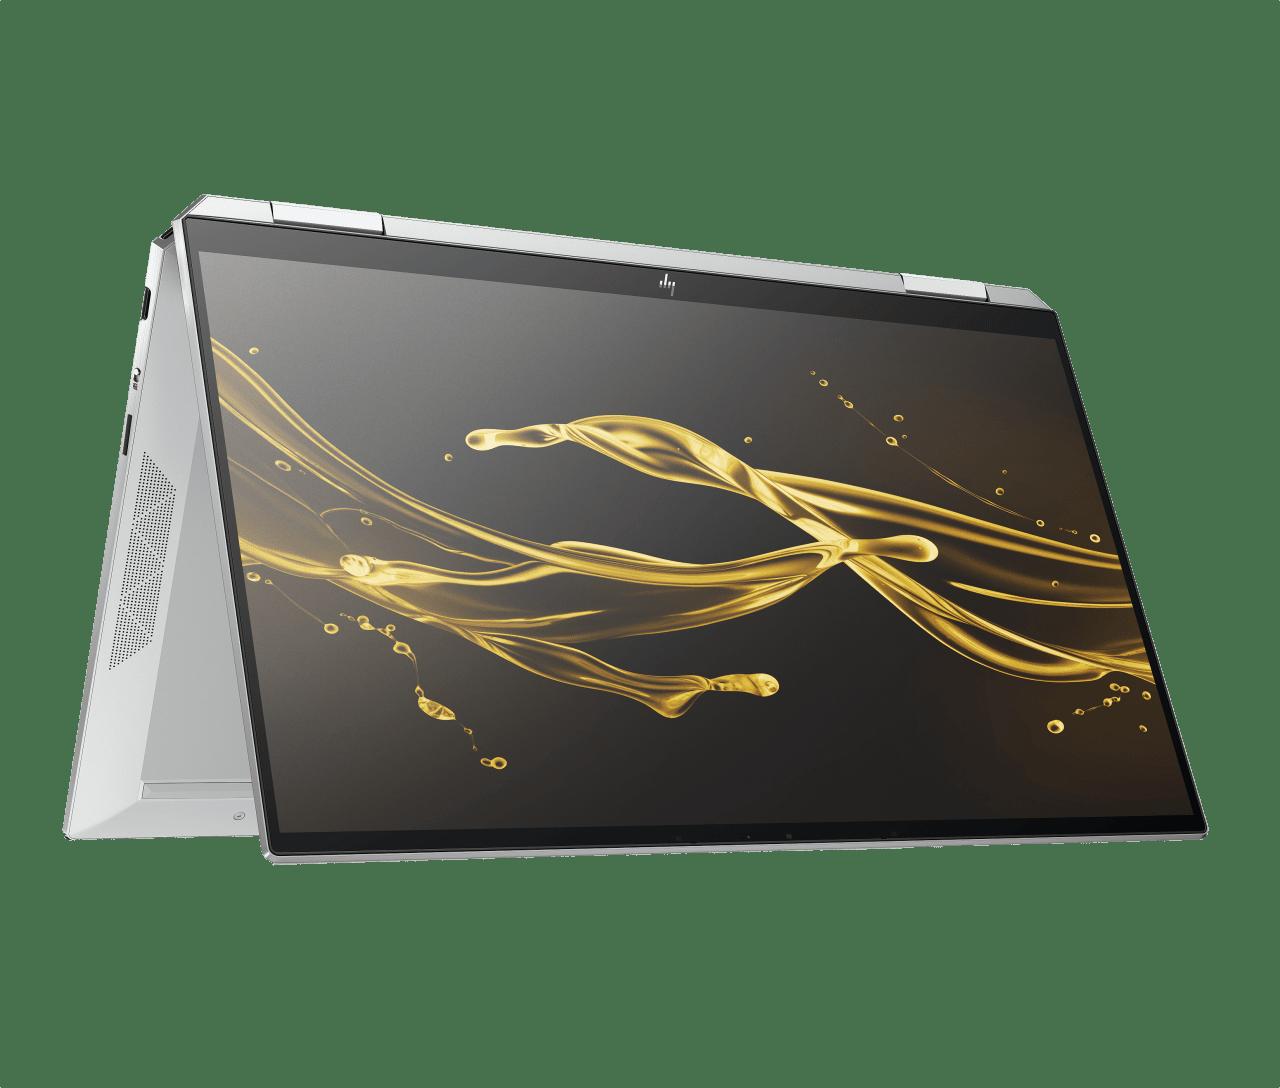 Natural Silver HP Spectre x360 13-aw0030ng Convertible - Intel® Core™ i7-1065G7 - 16GB - 1TB PCIe - Intel® Iris® Plus Graphics.1